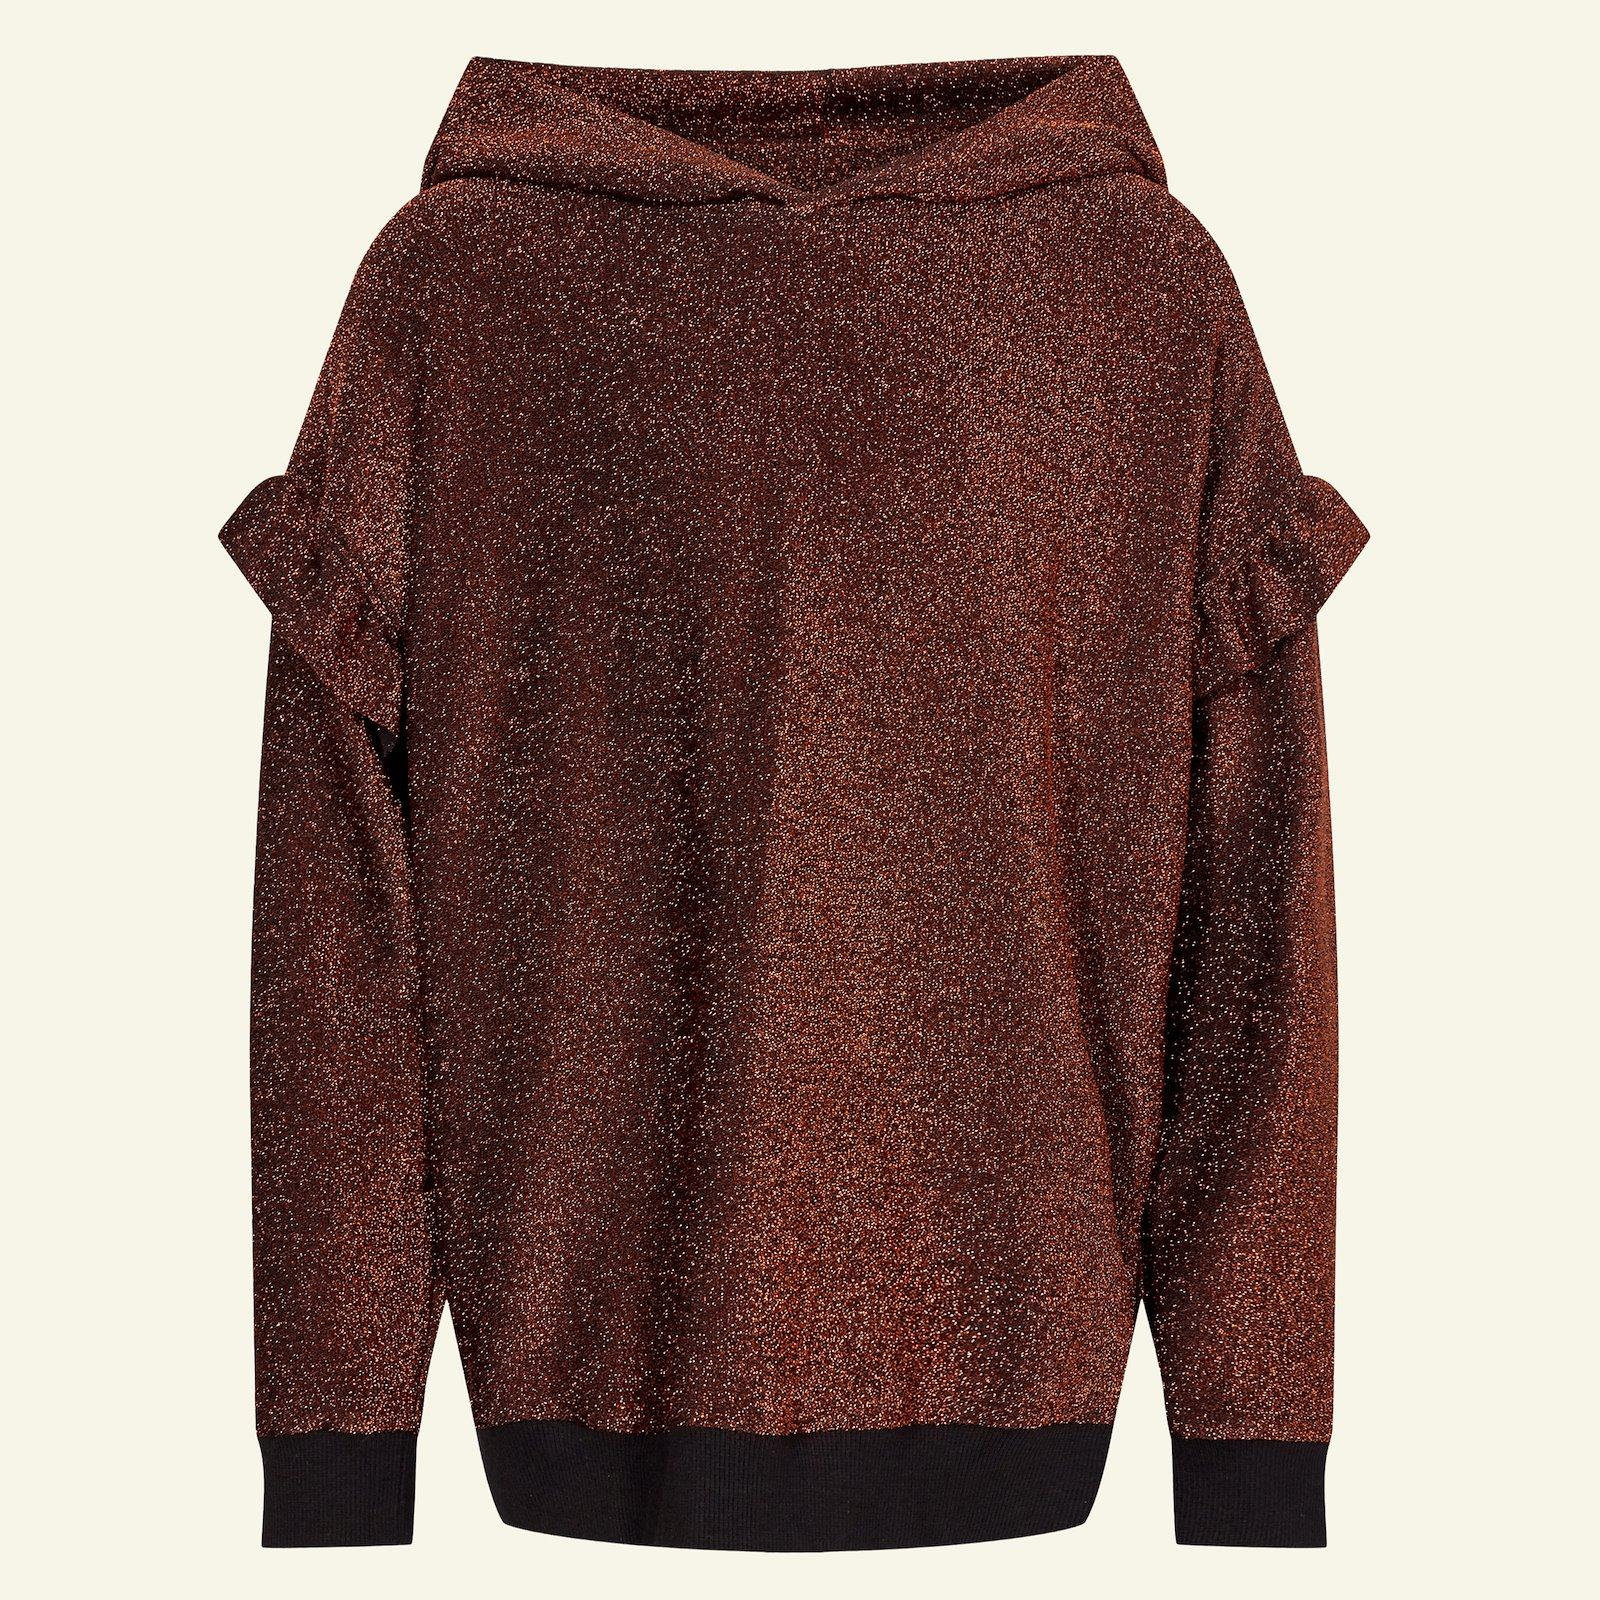 Sweatshirt w. hood + pocket, 134/9y p62020_272529_272436_sskit